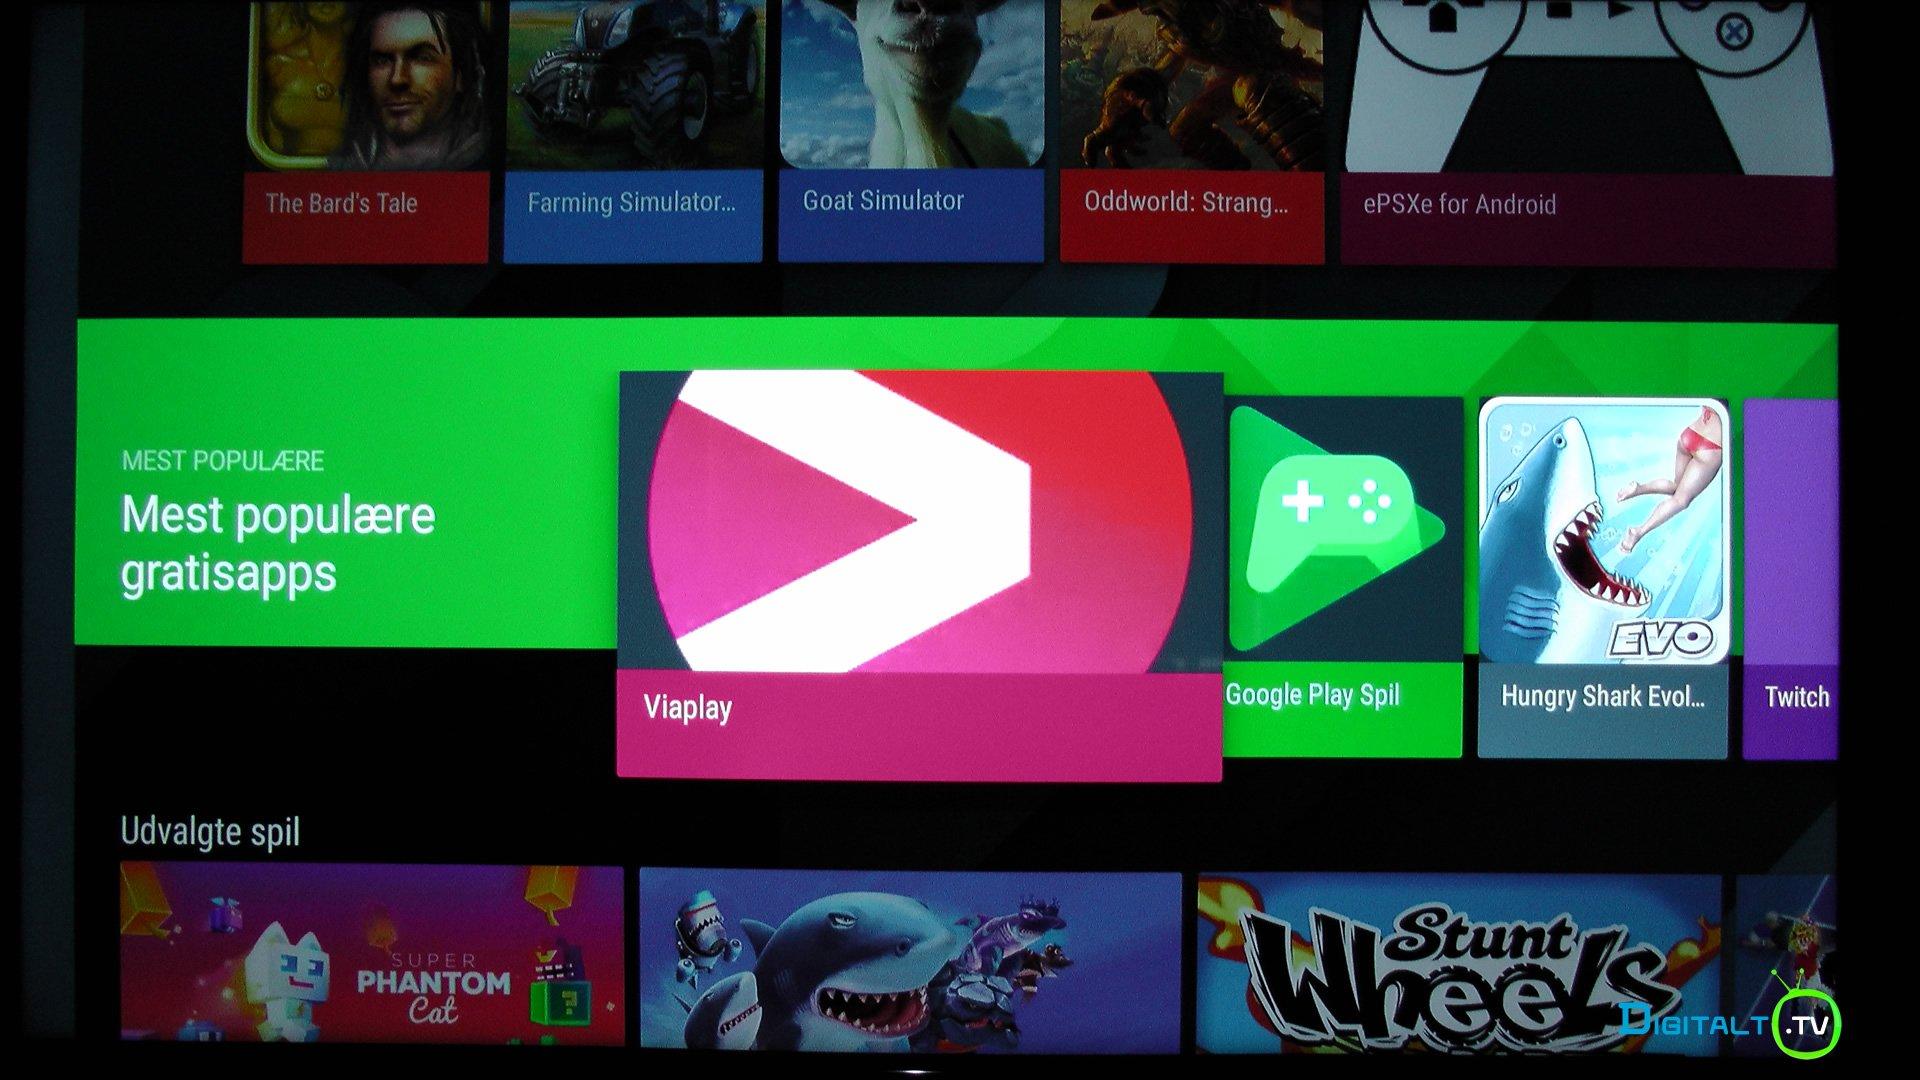 sony tv viaplay app